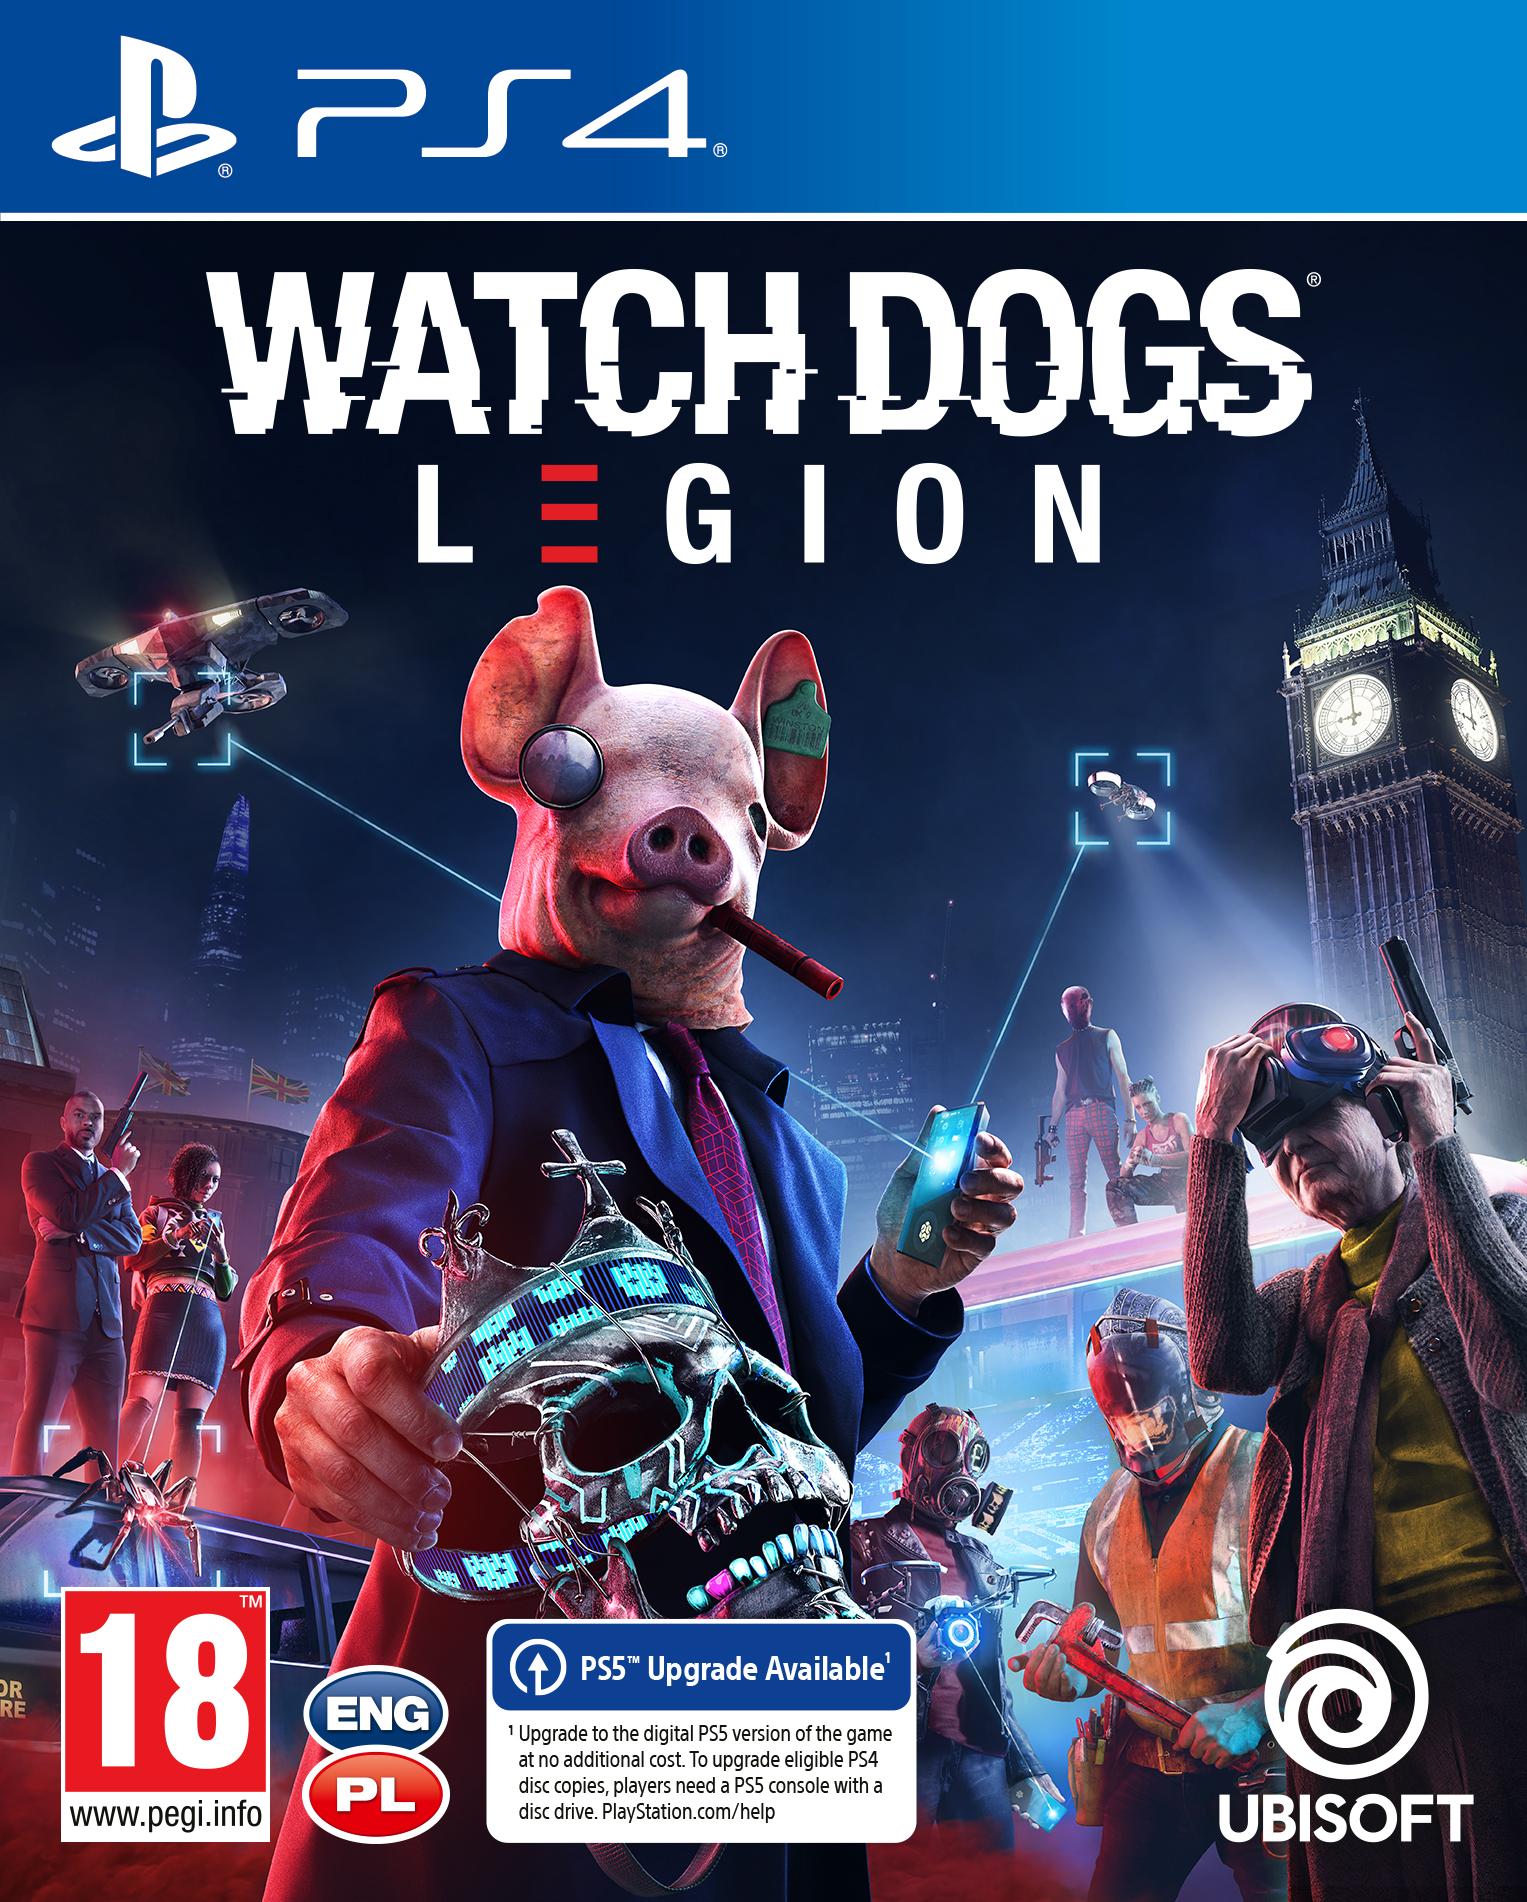 Watch Dogs: Legion (PS4) + BONUS!